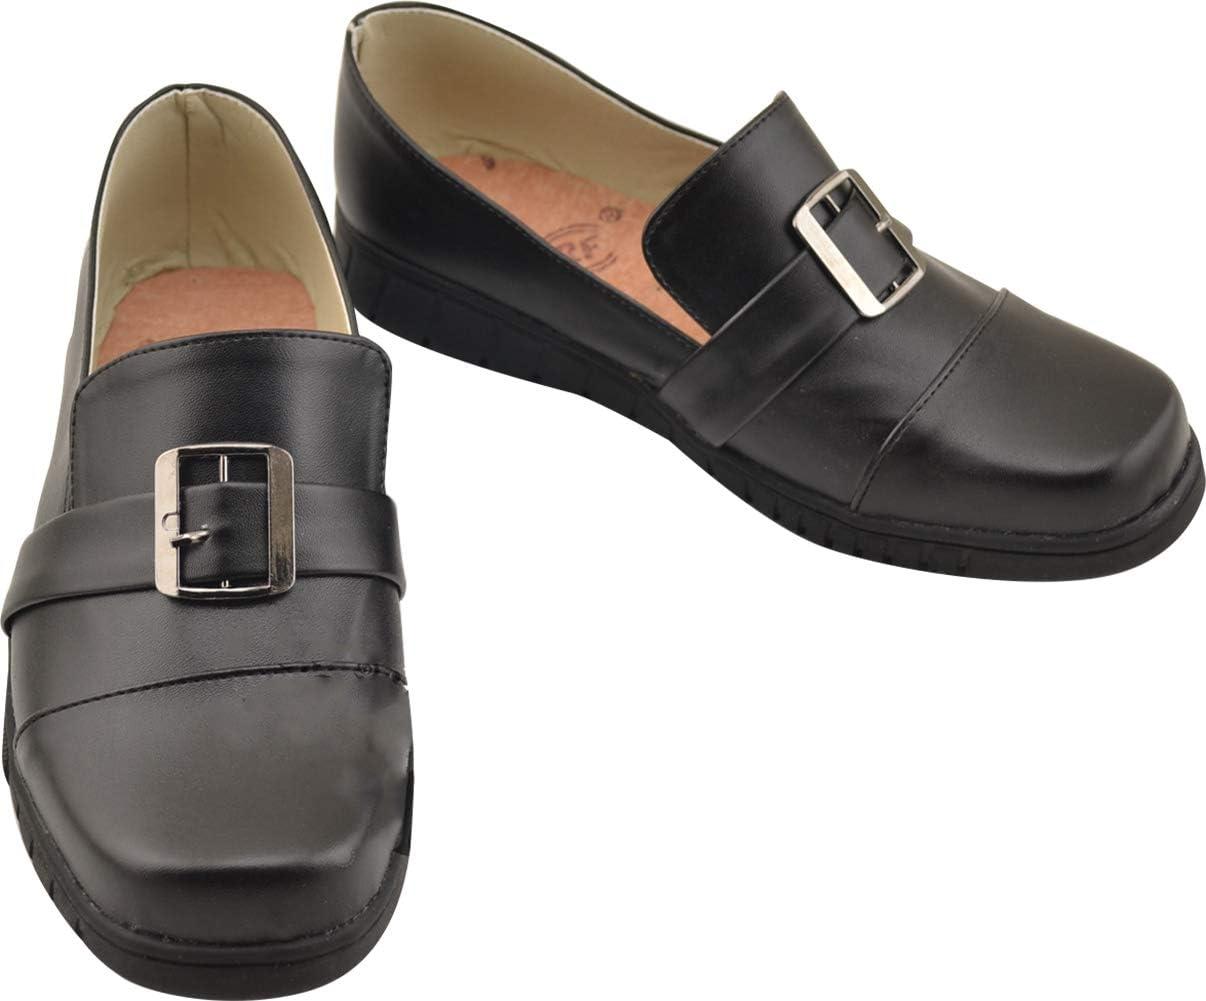 GSFDHDJS Cosplay Stiefel Schuhe for Black Butler Ciel Phantomhive Custom Version